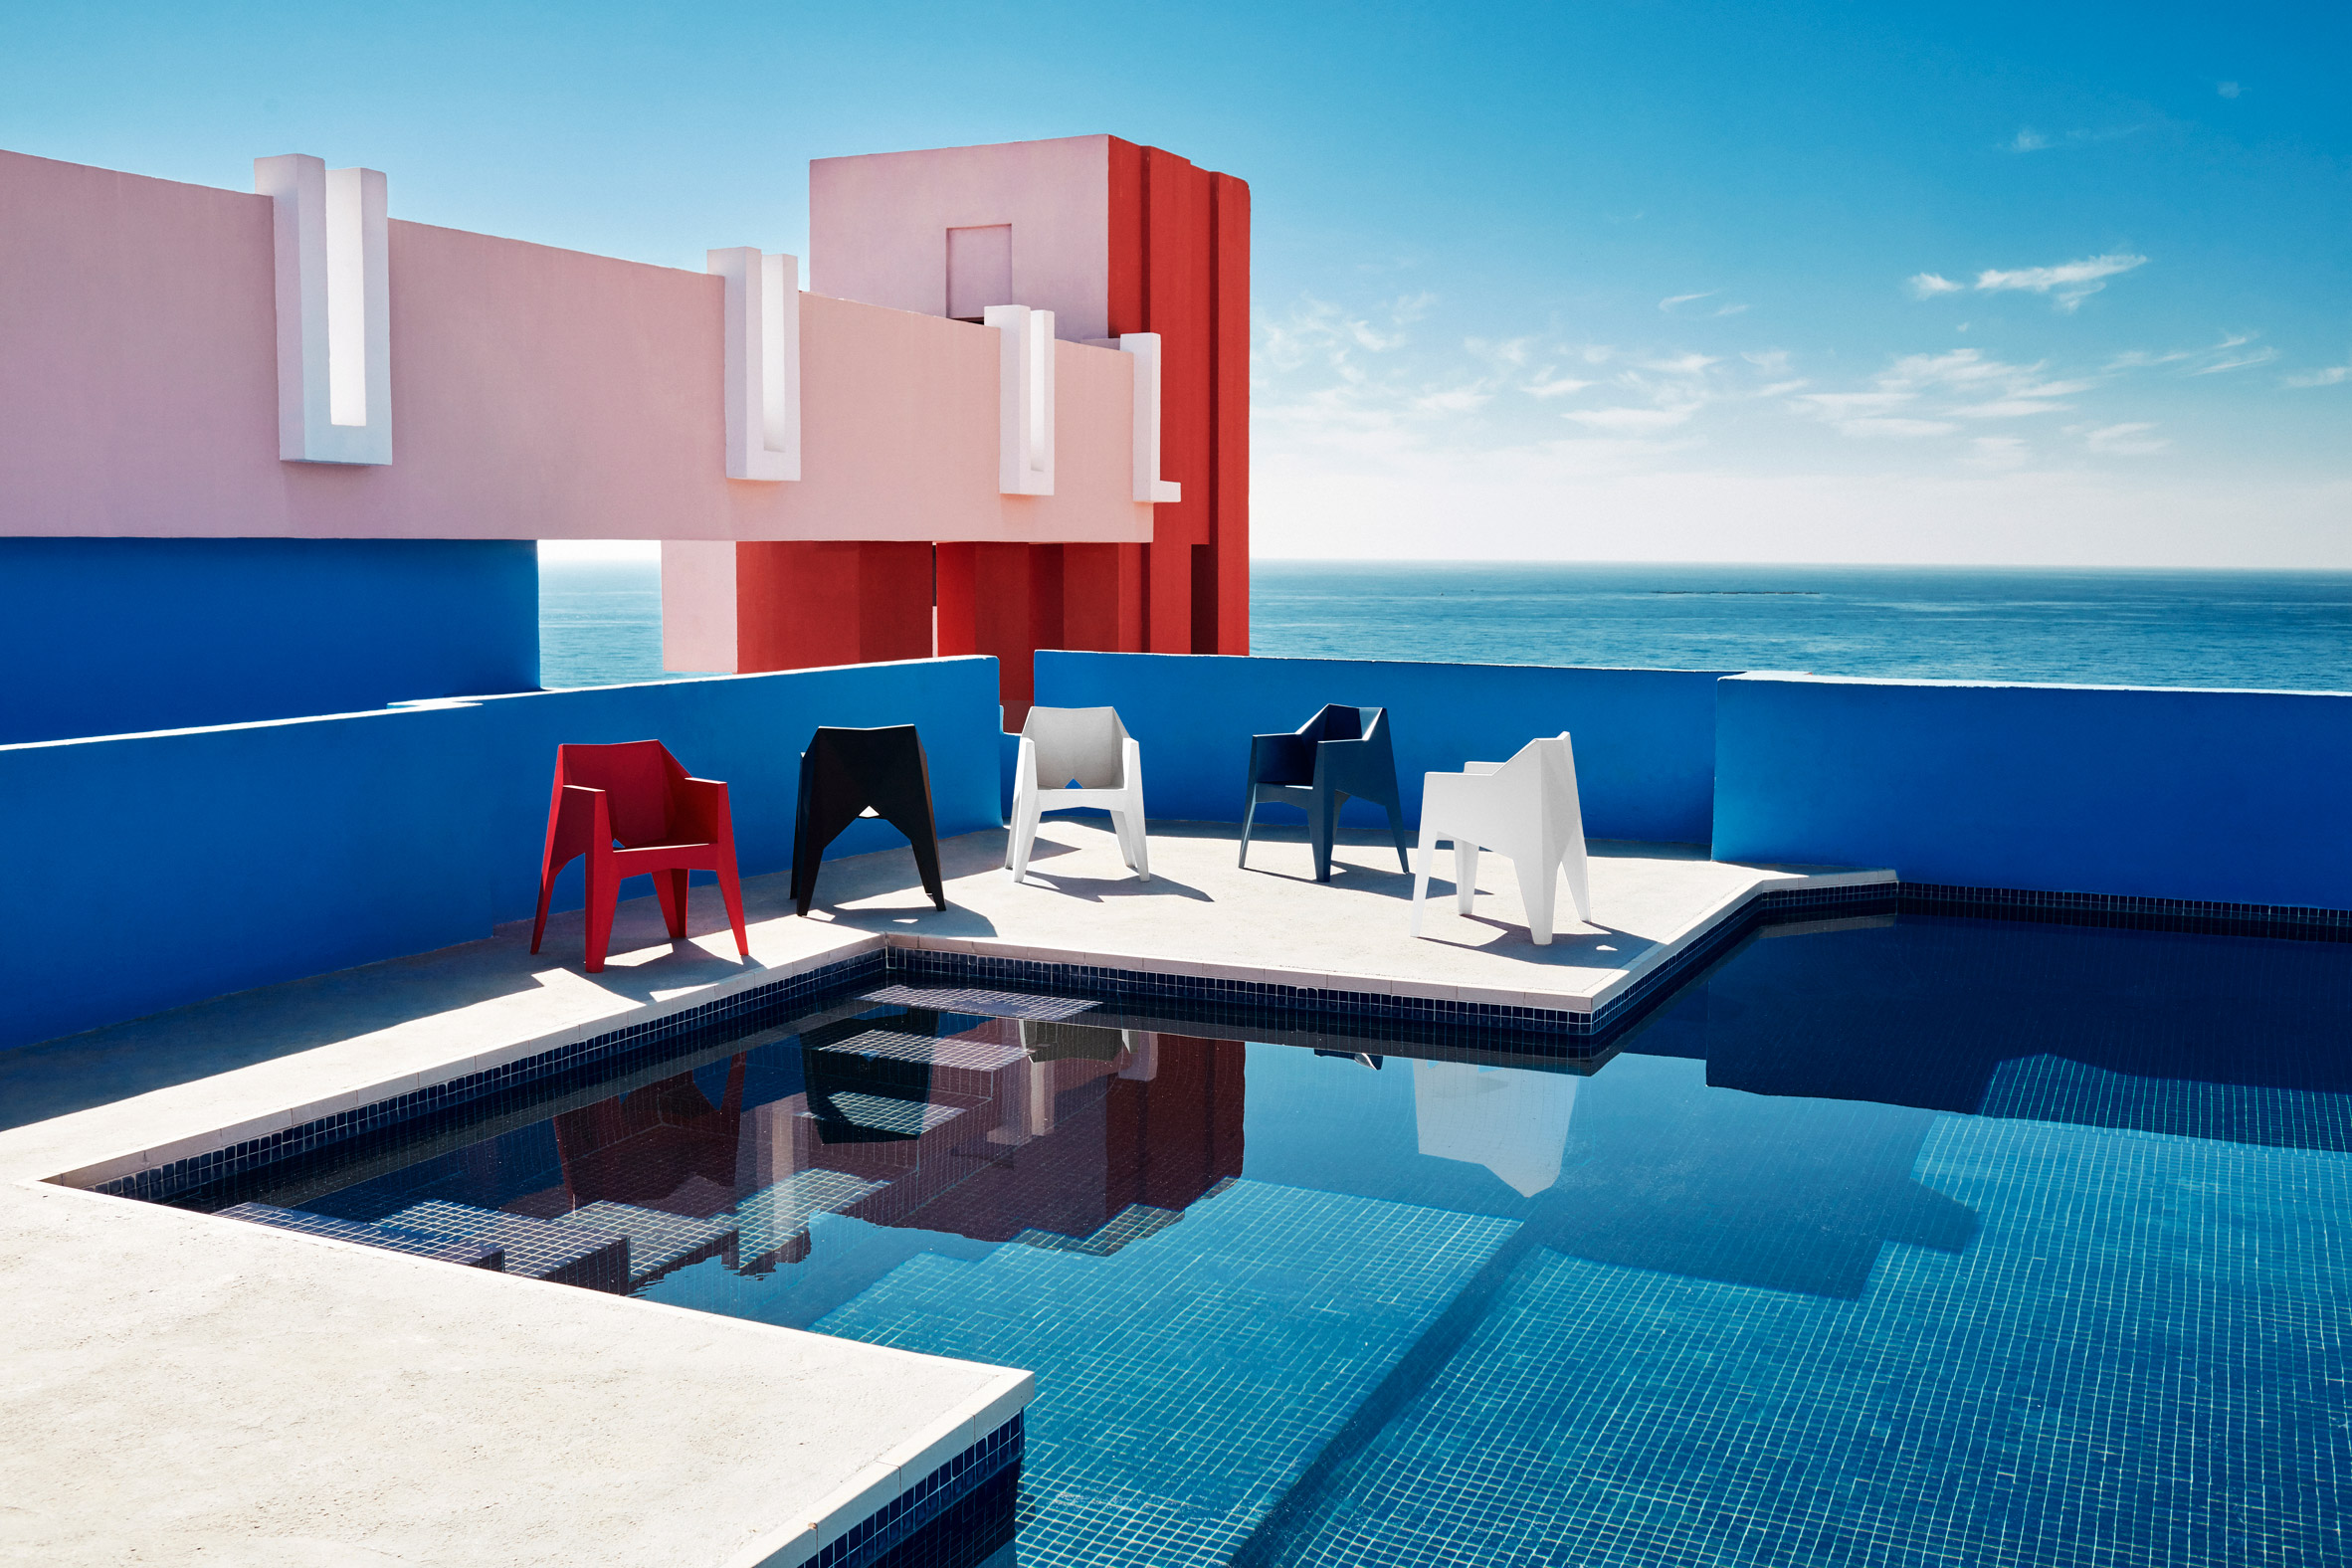 Voxel armchairs by Karim Rashid for Vondom